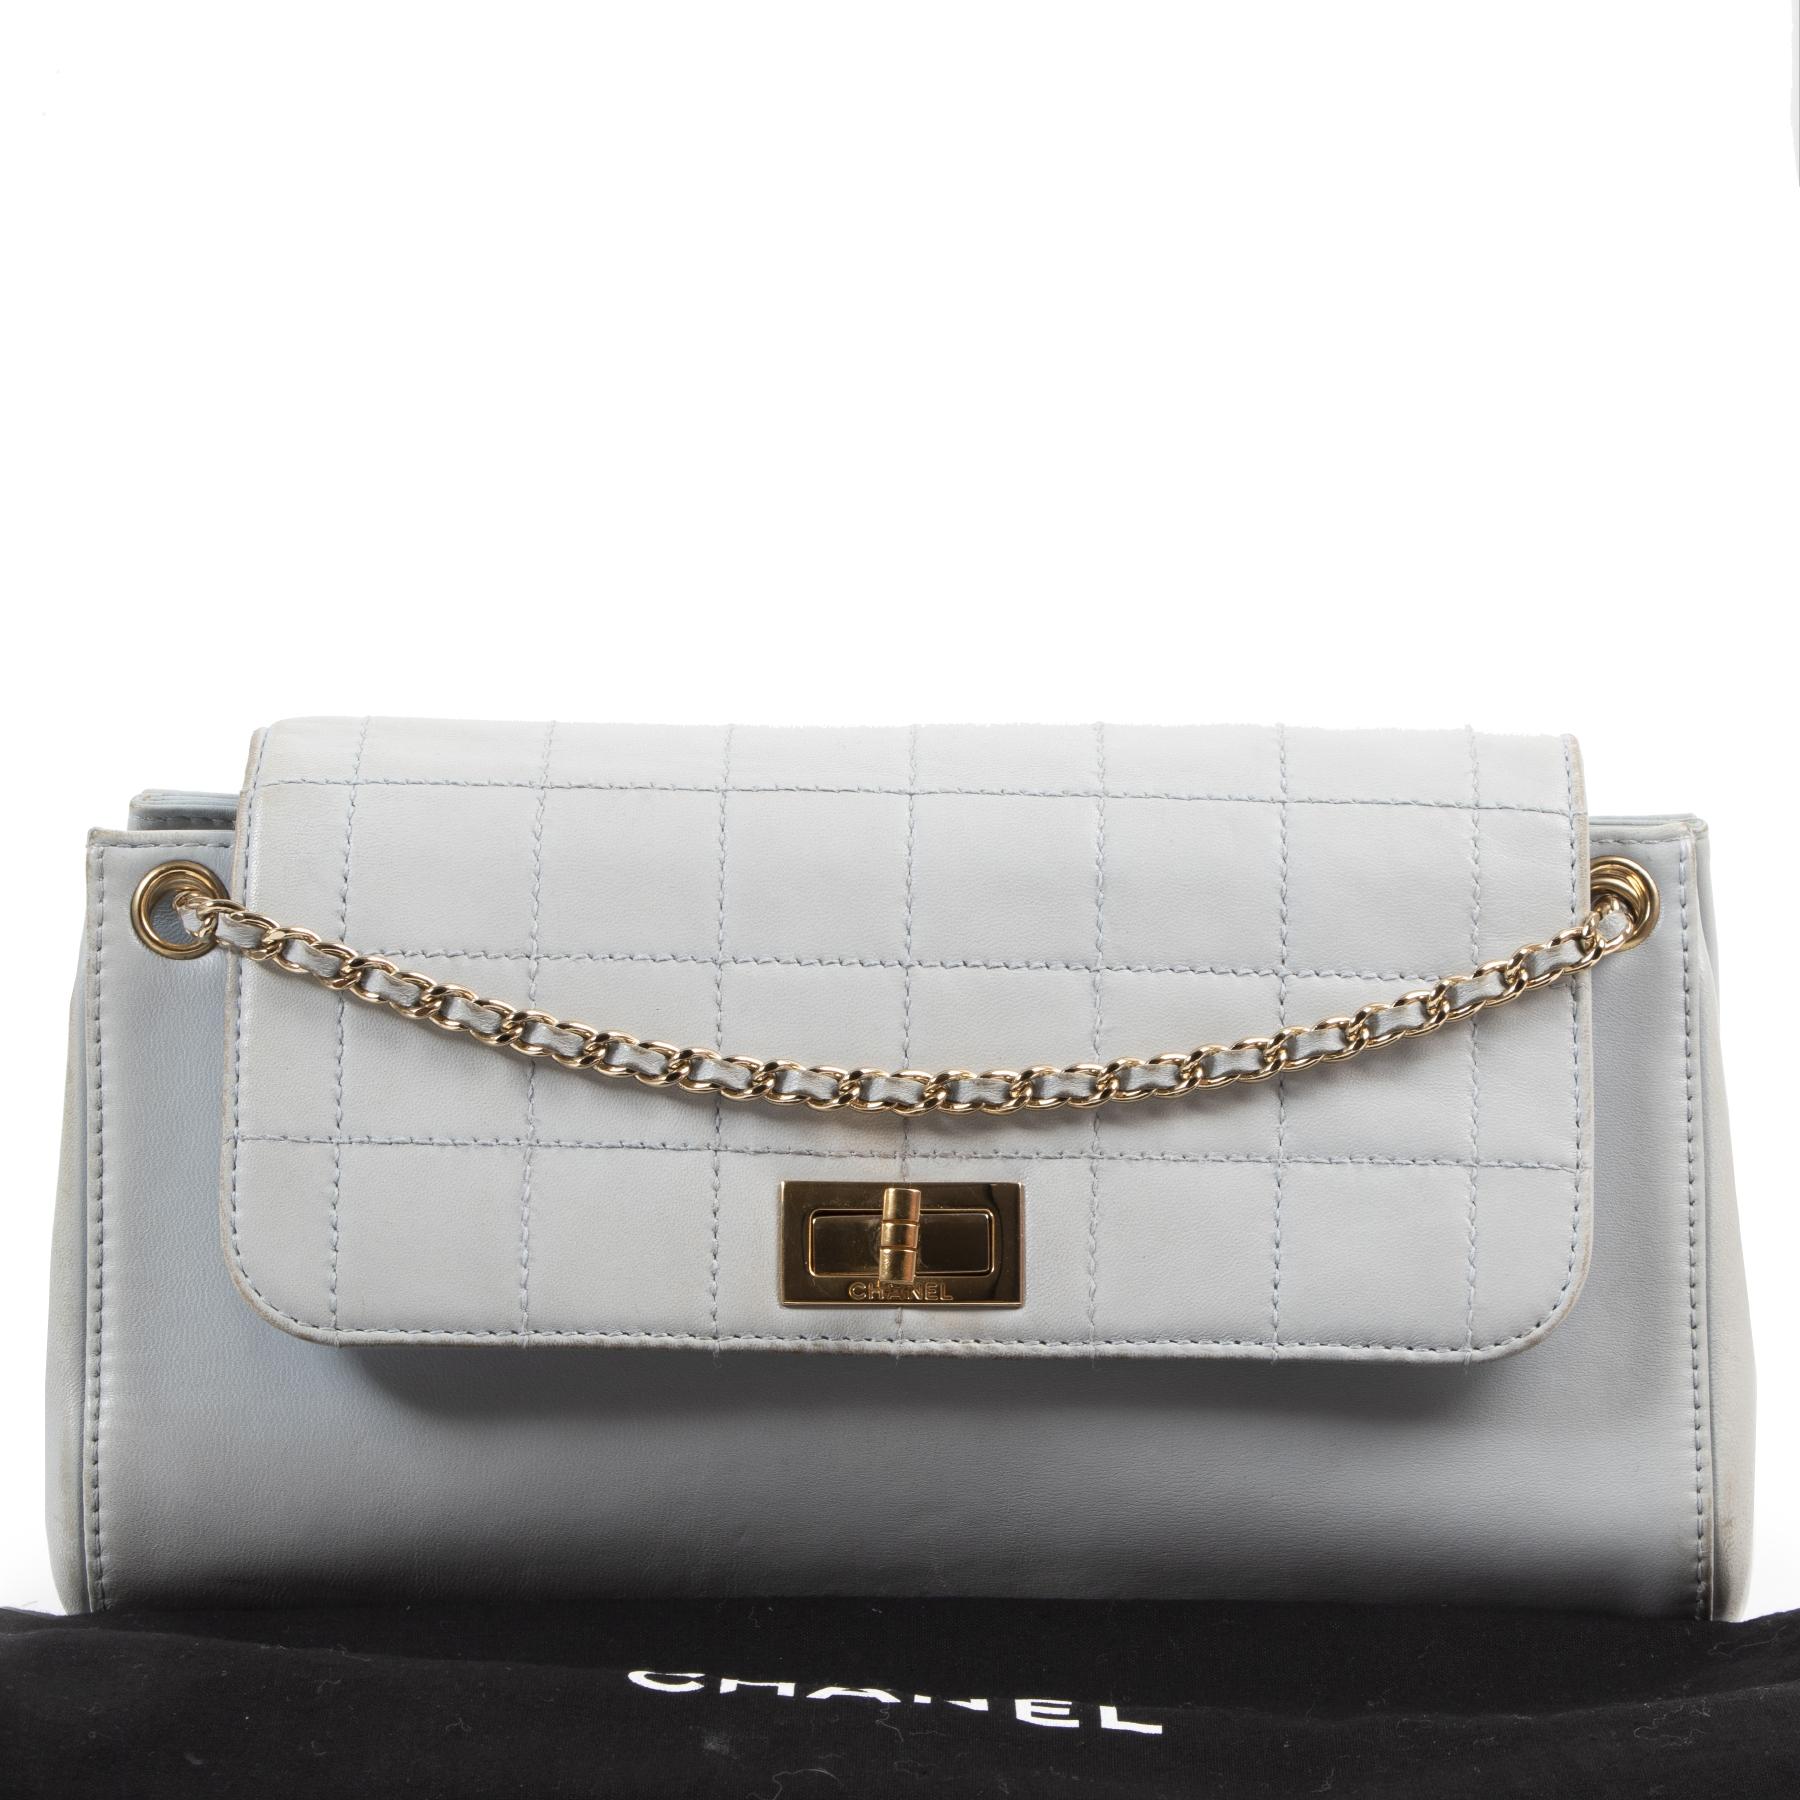 Designer merken Chanel tassen bij LabelLOV Antwerpen.